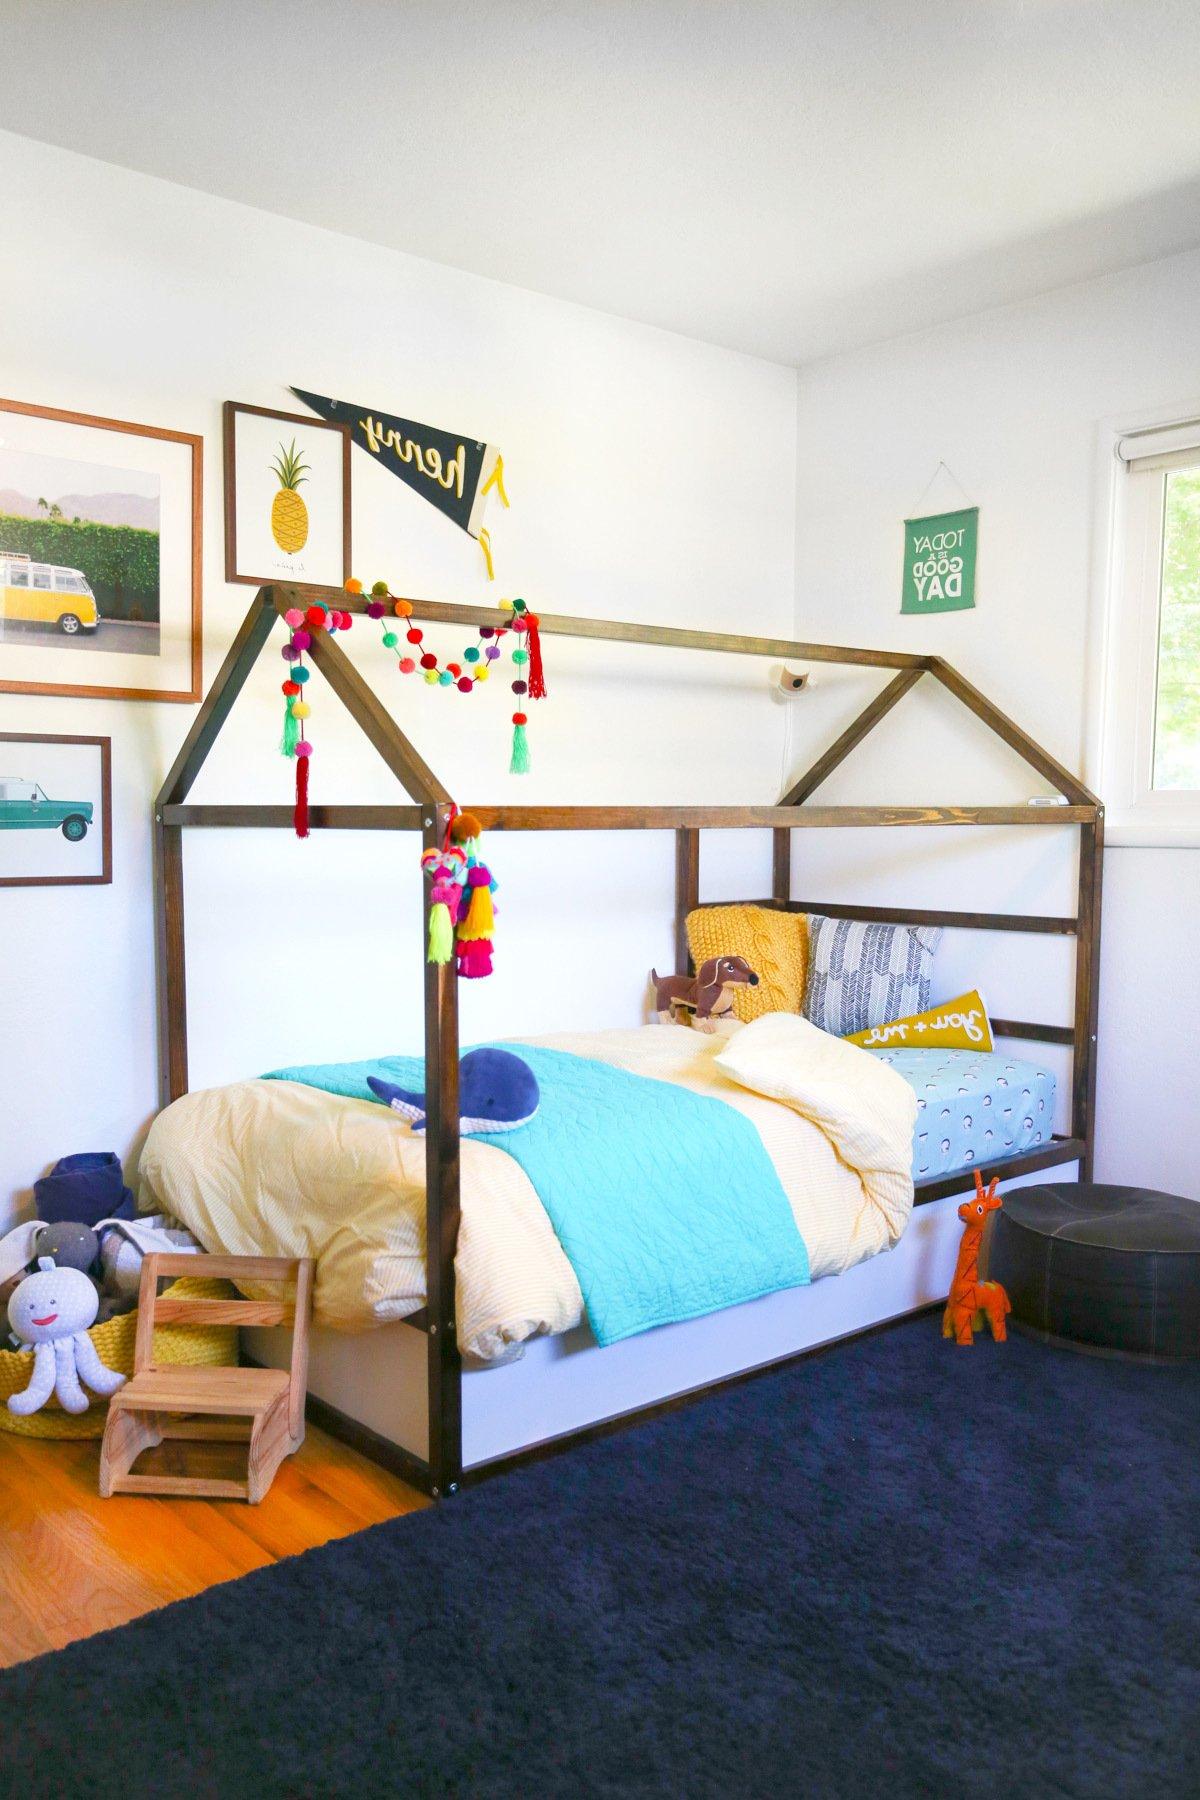 Kinderzimmer Pimpen 10 Diy Hacks Fur Ihr Ikea Kura Bett